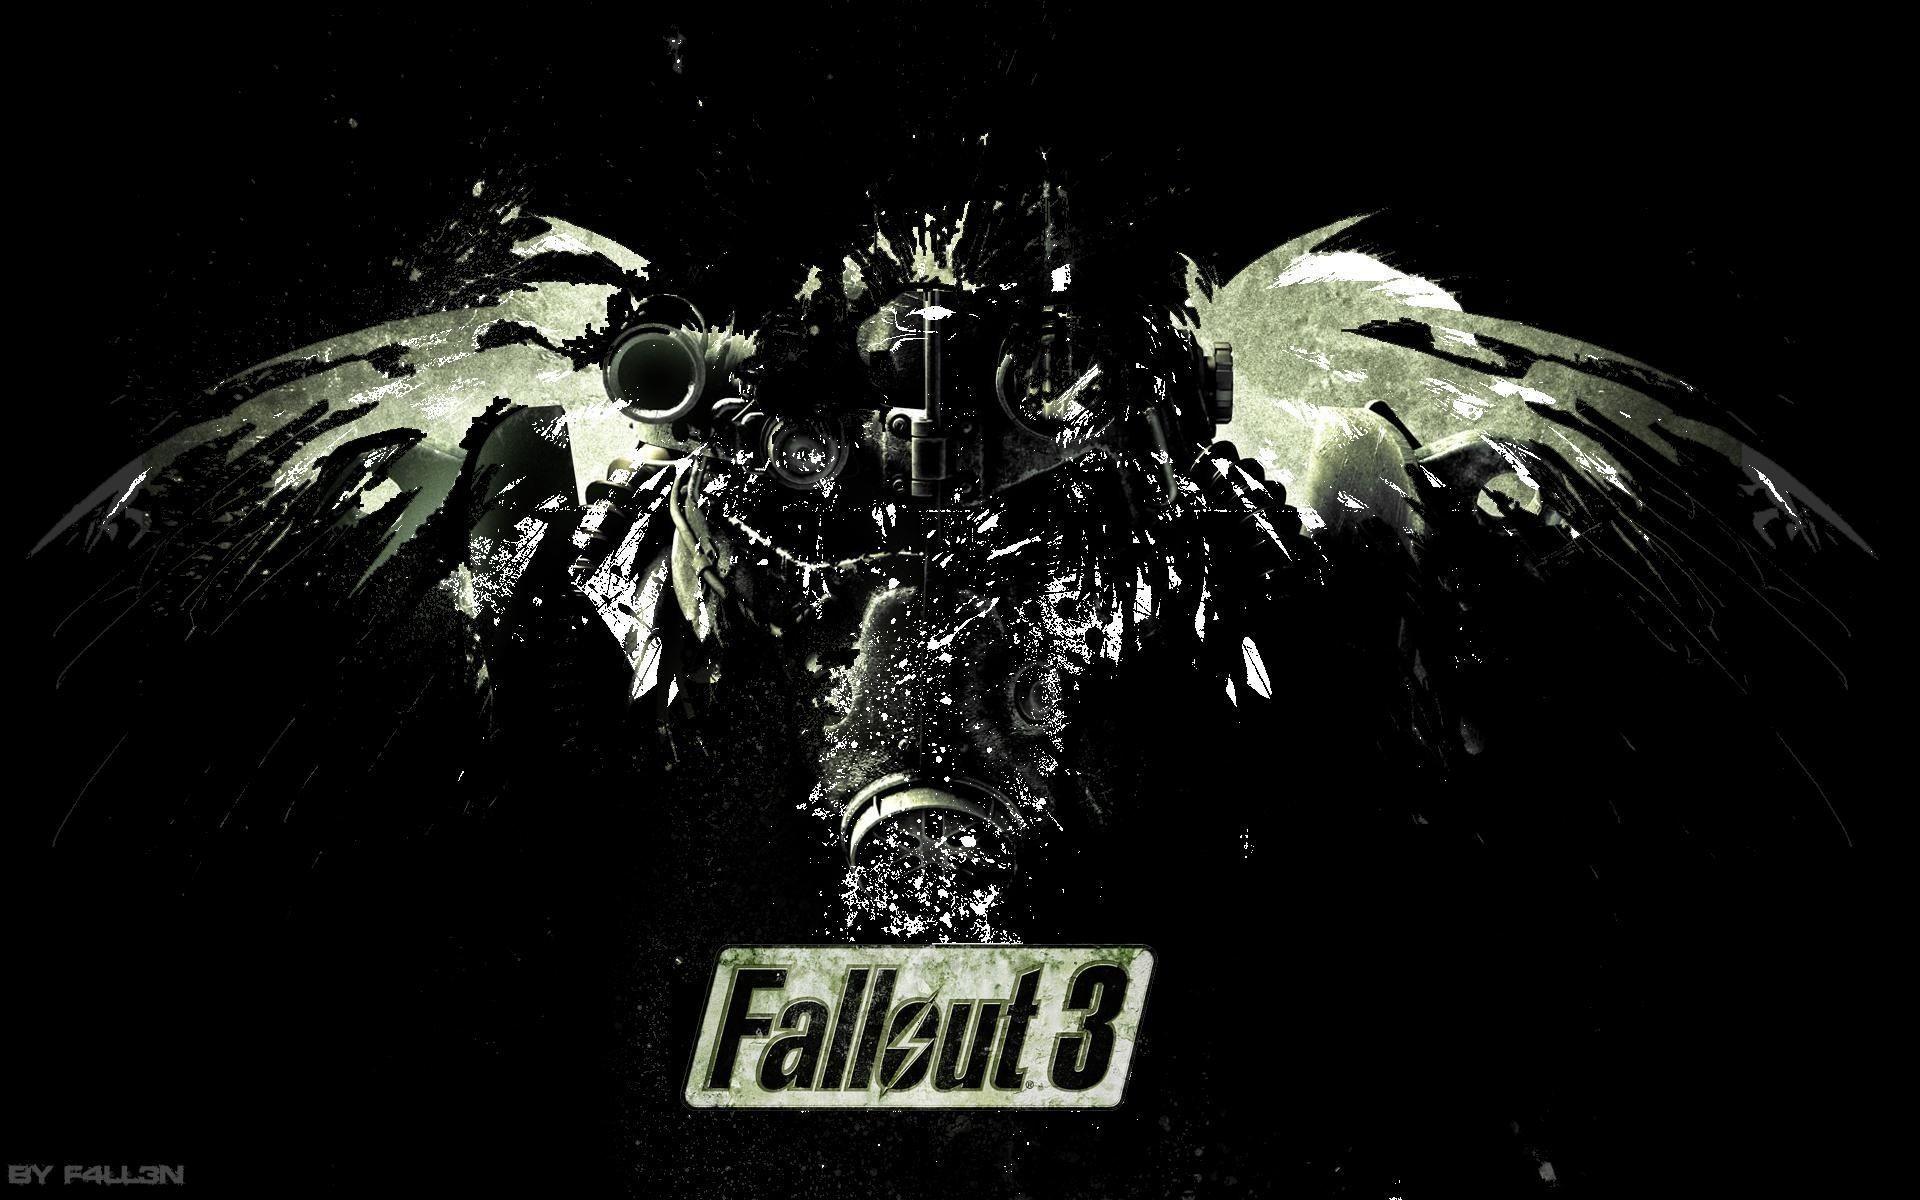 Fallout 3 Wallpaper Hd – Wallpapers High Definition